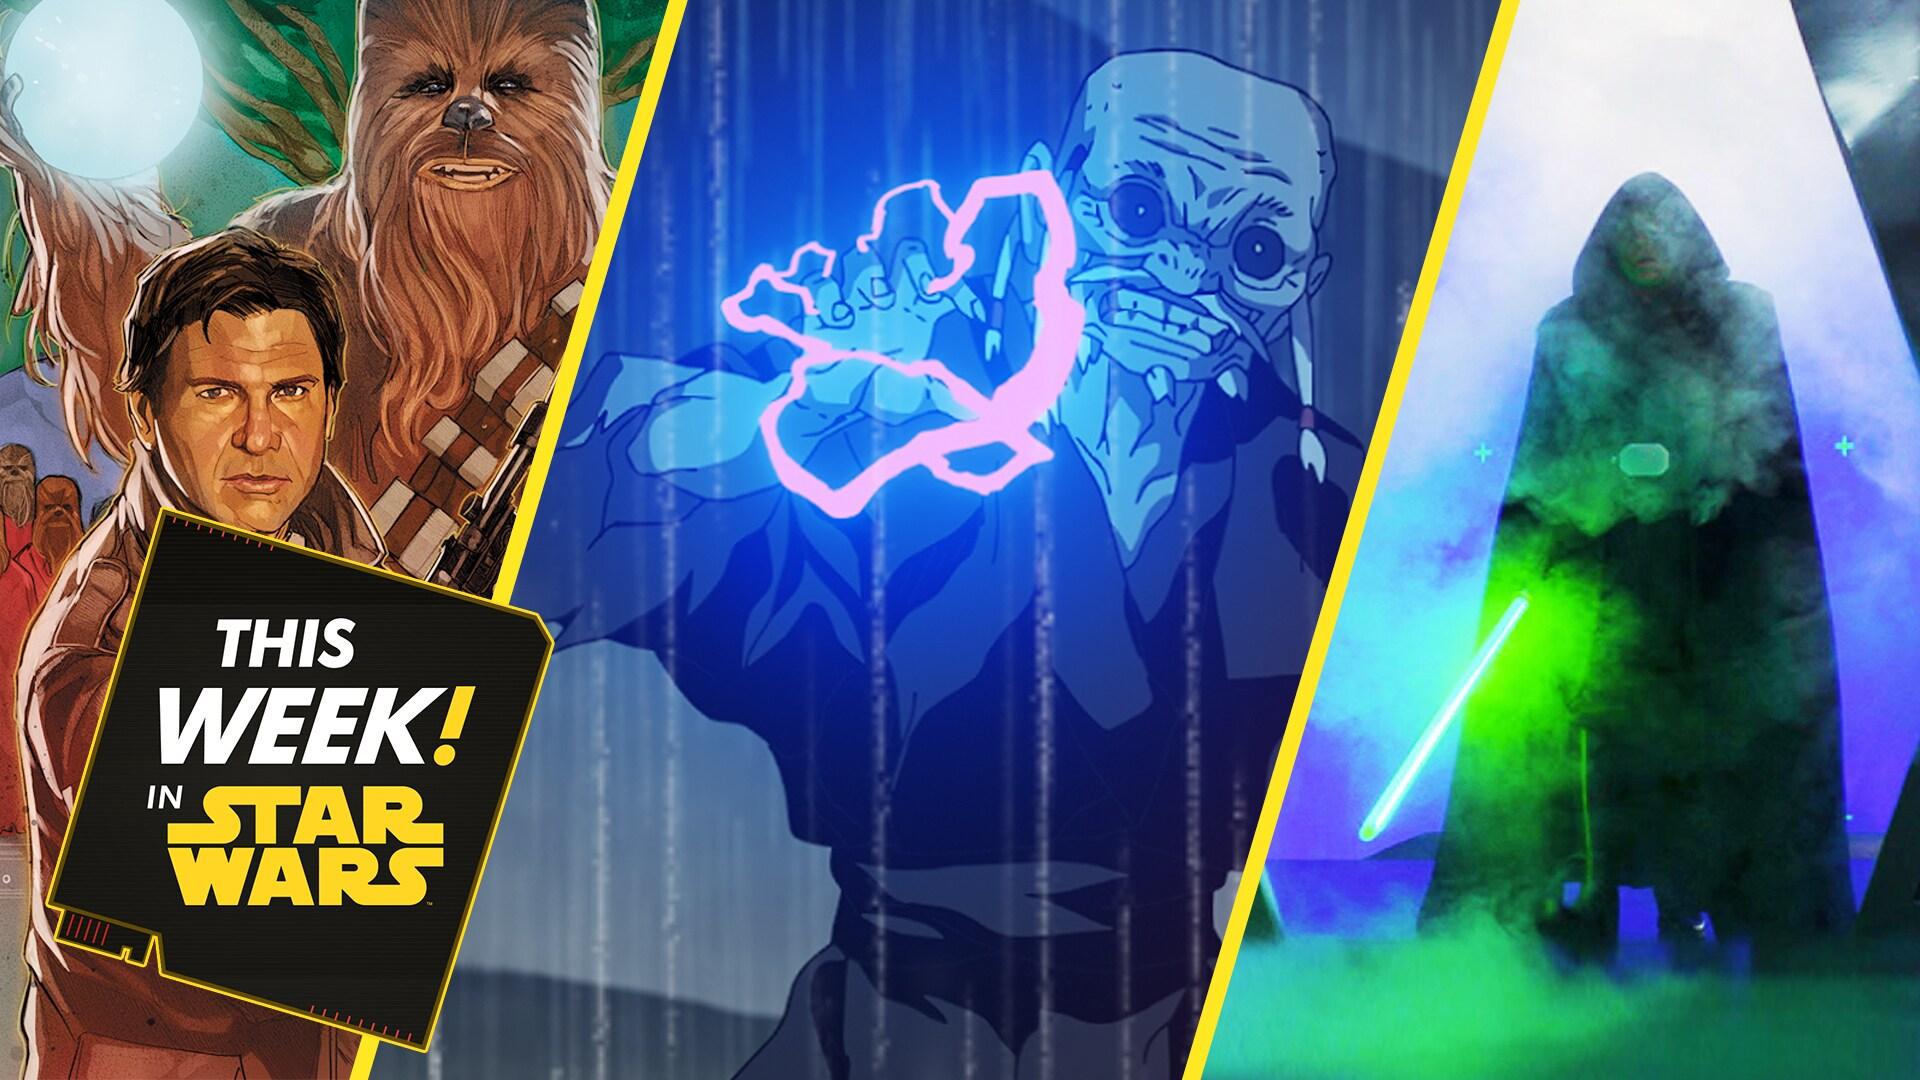 Star Wars: Visions Sneak Peek, The Bad Batch Season 1 Finale, and More!